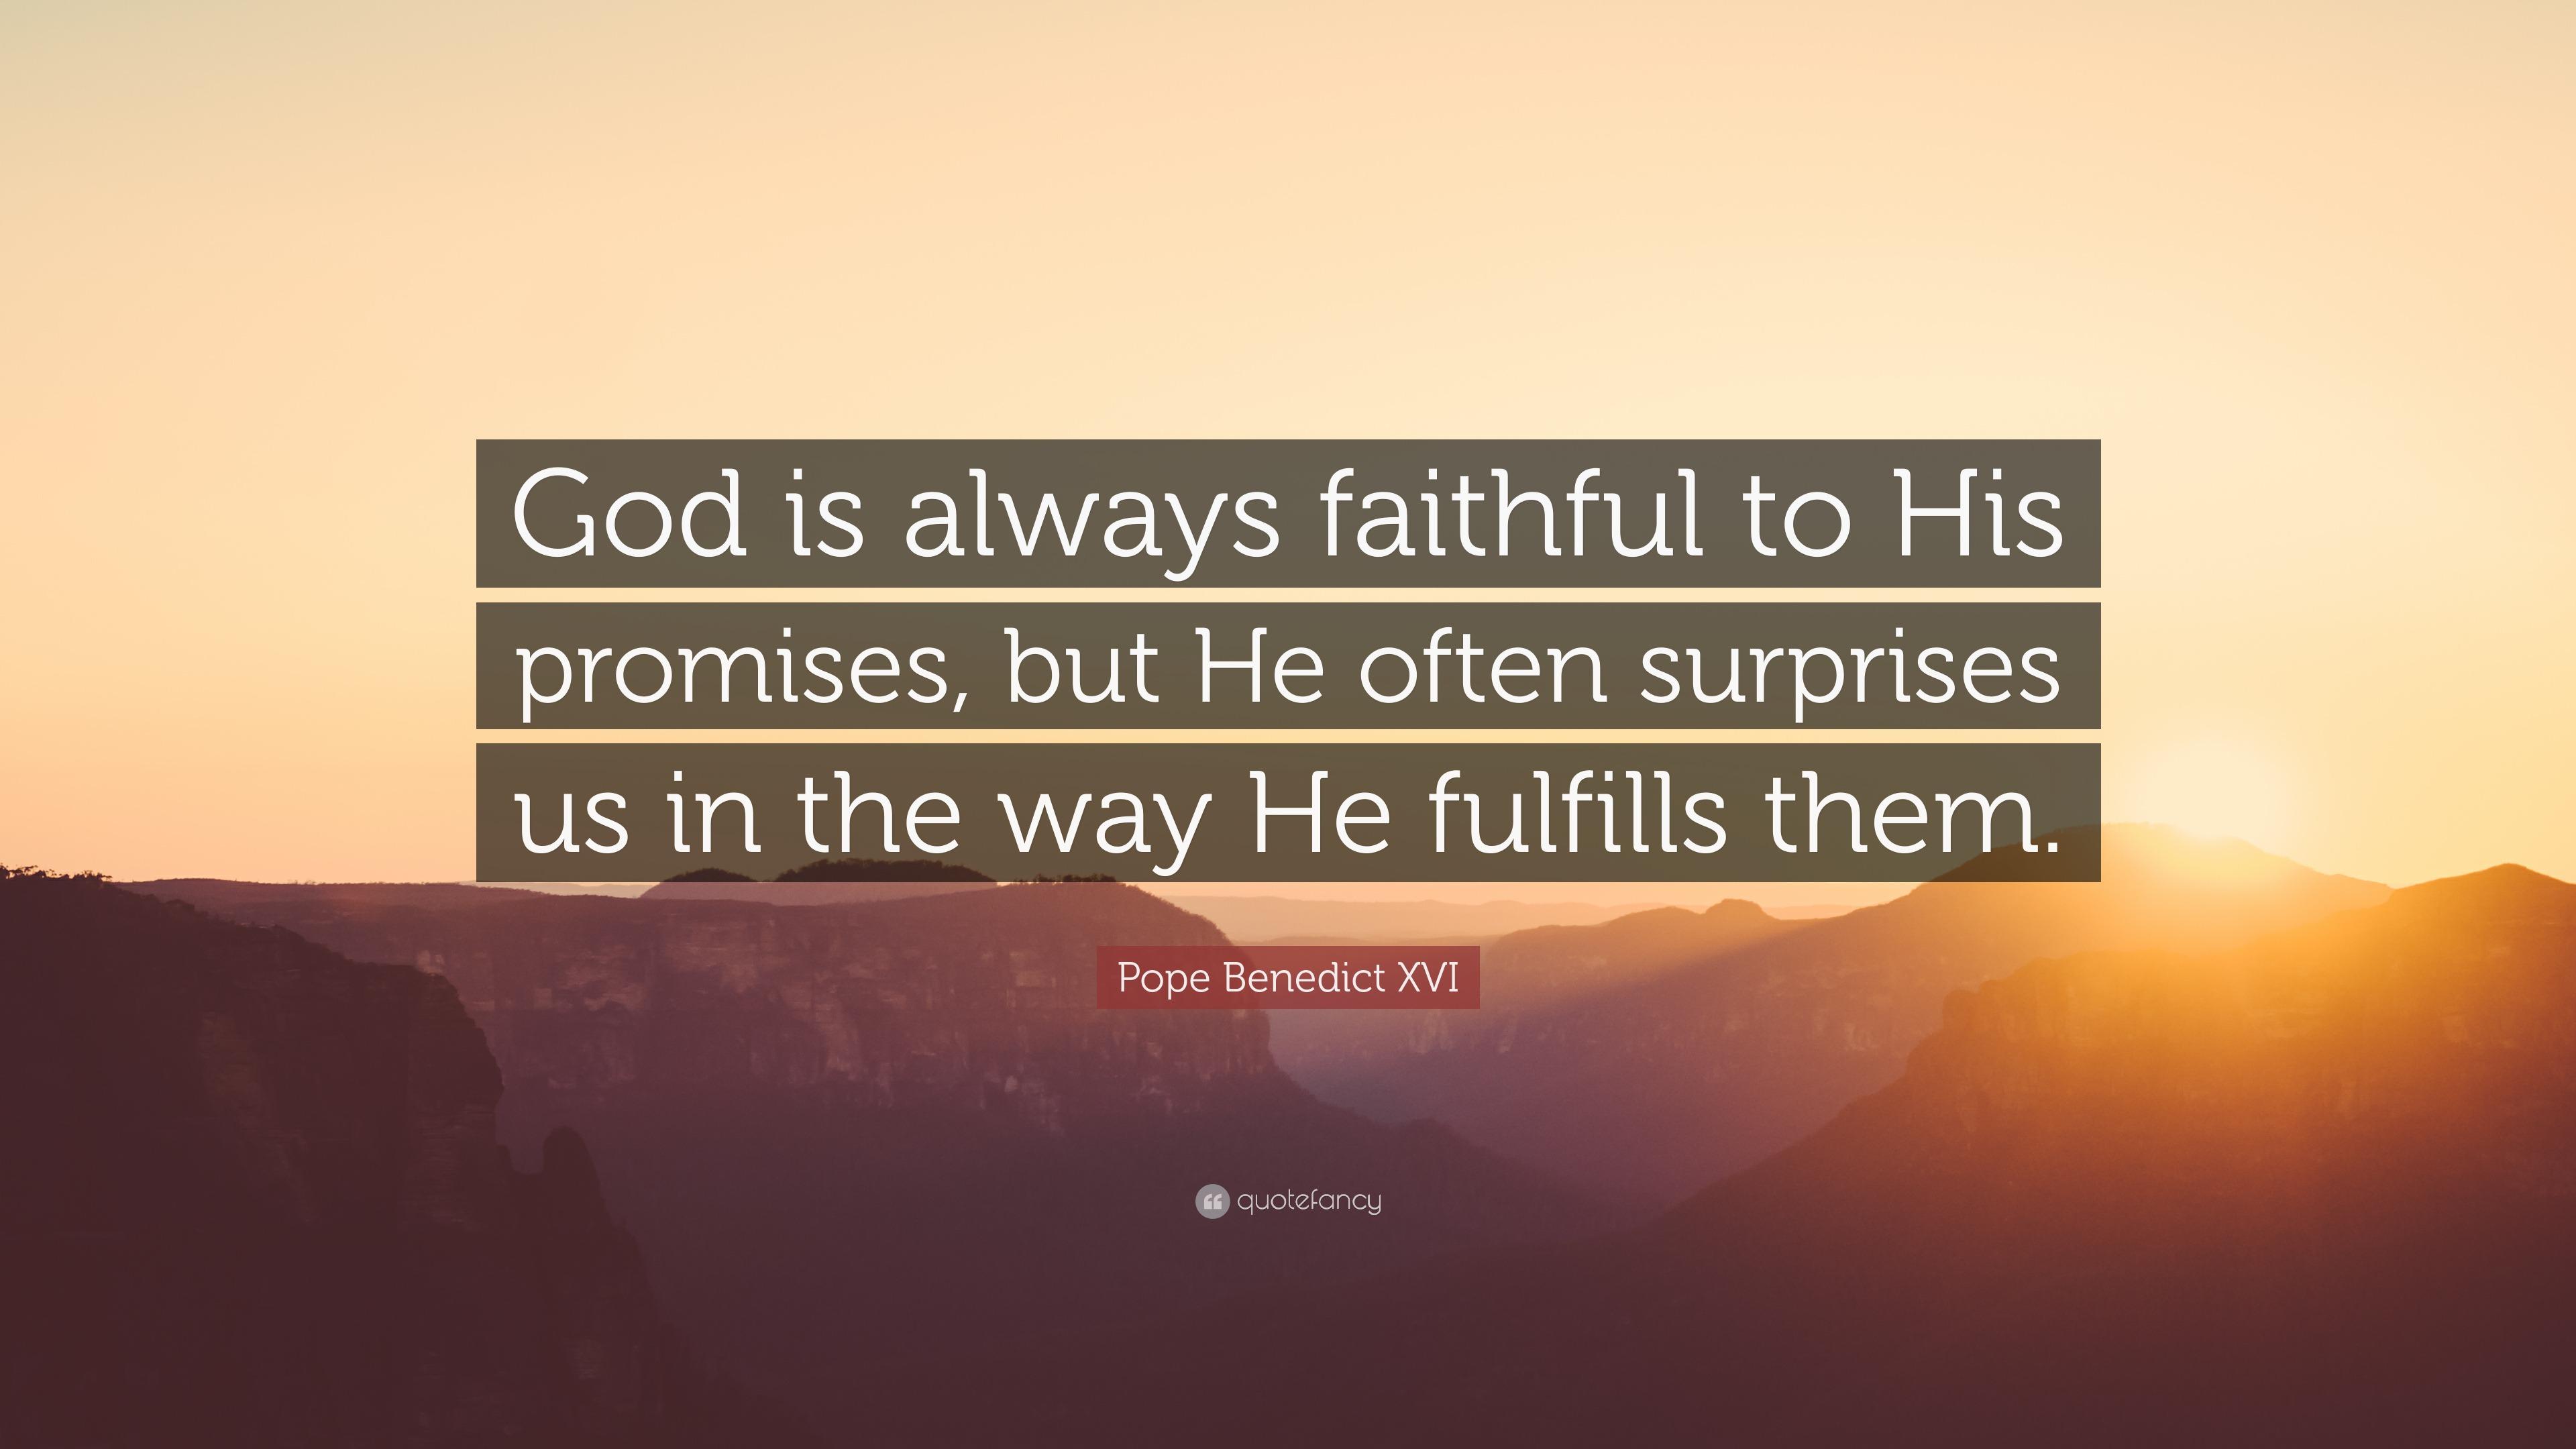 Pope Benedict Xvi Quote God Is Always Faithful To His Promises